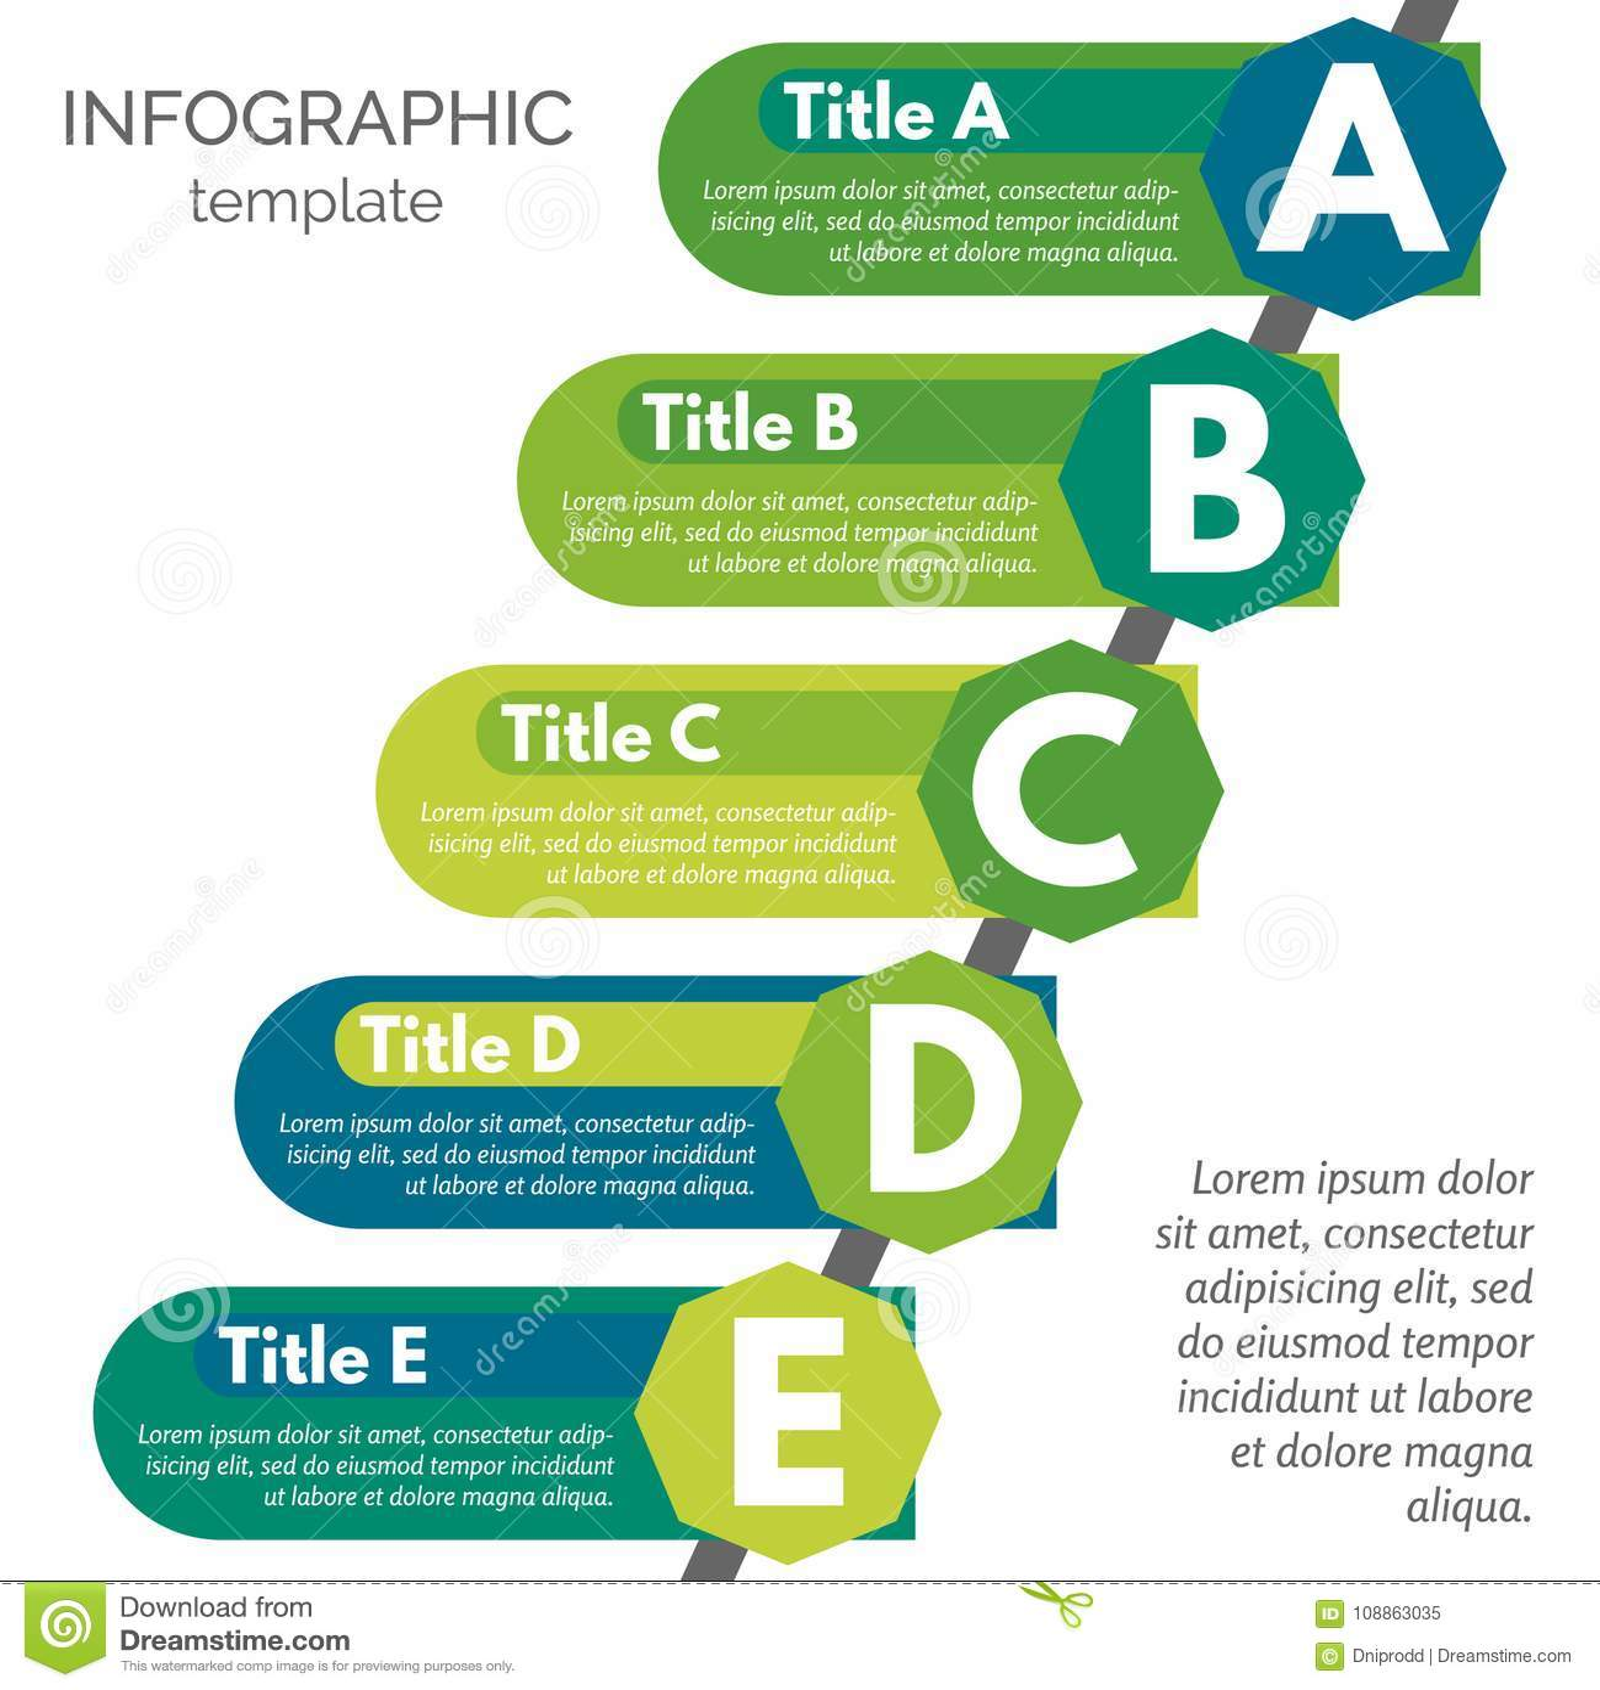 five steps infographic design elements stock vector illustration